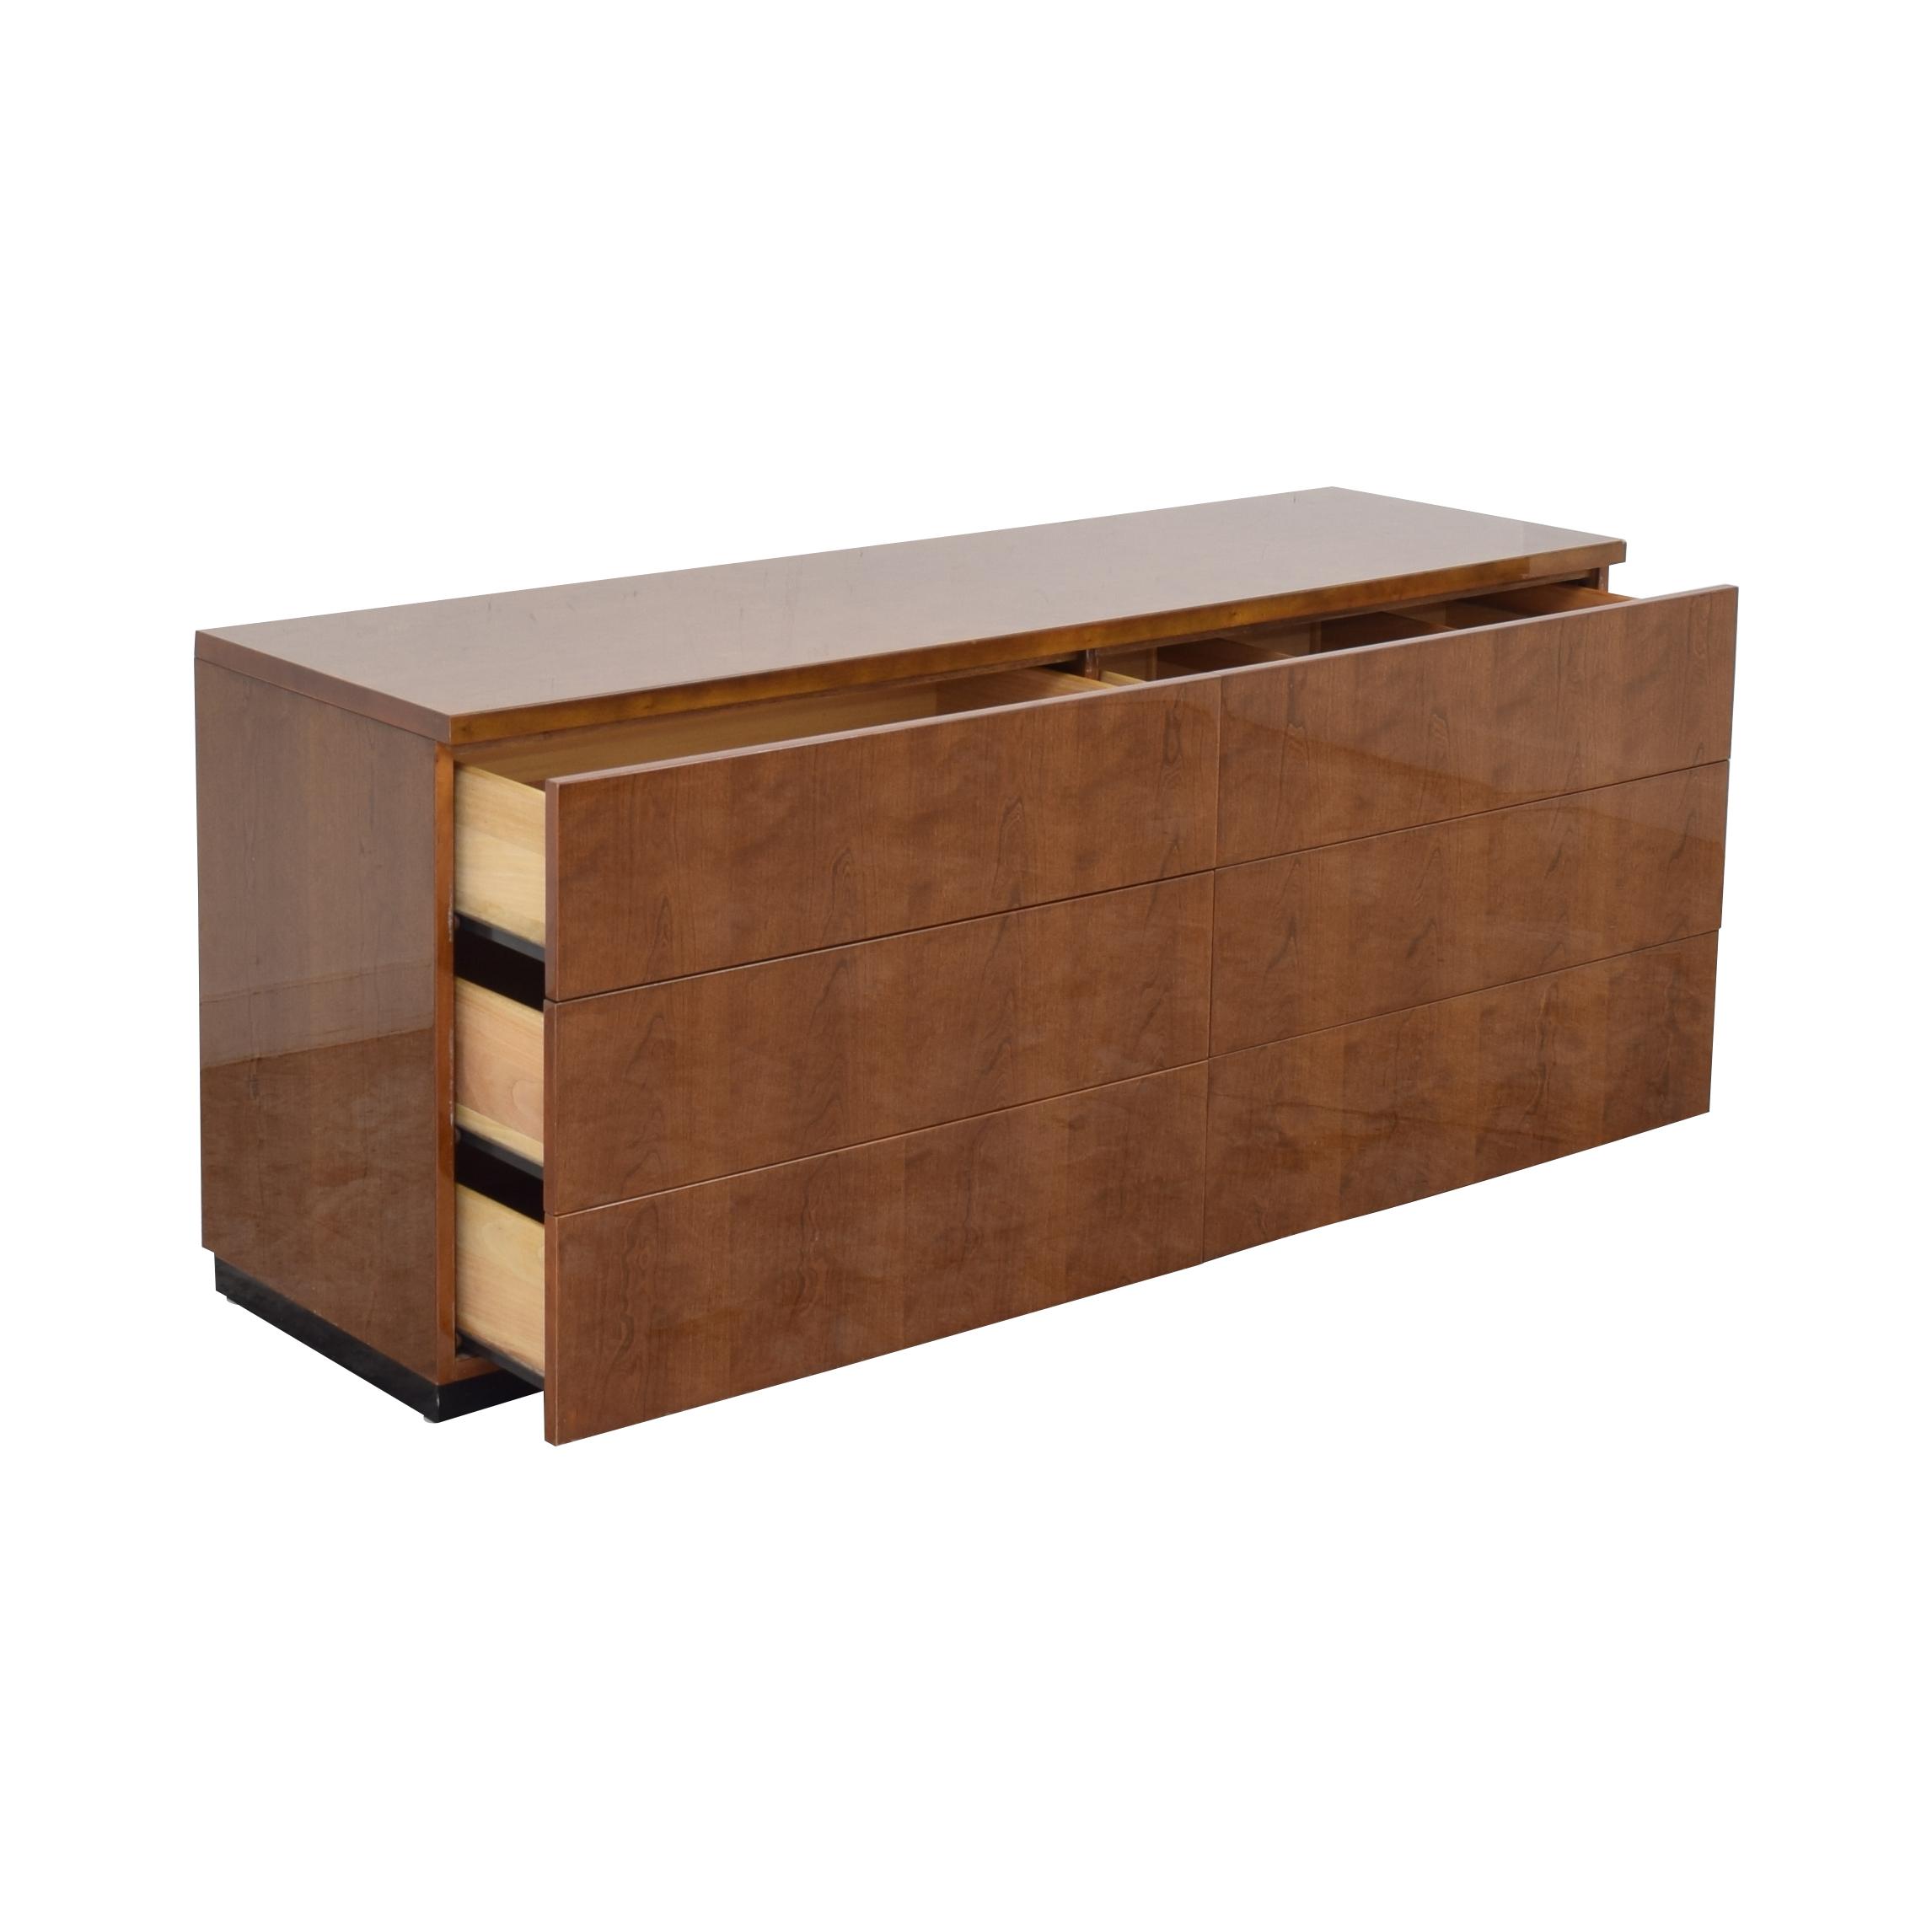 Henredon Furniture Henredon Furniture Six Drawer Dresser price